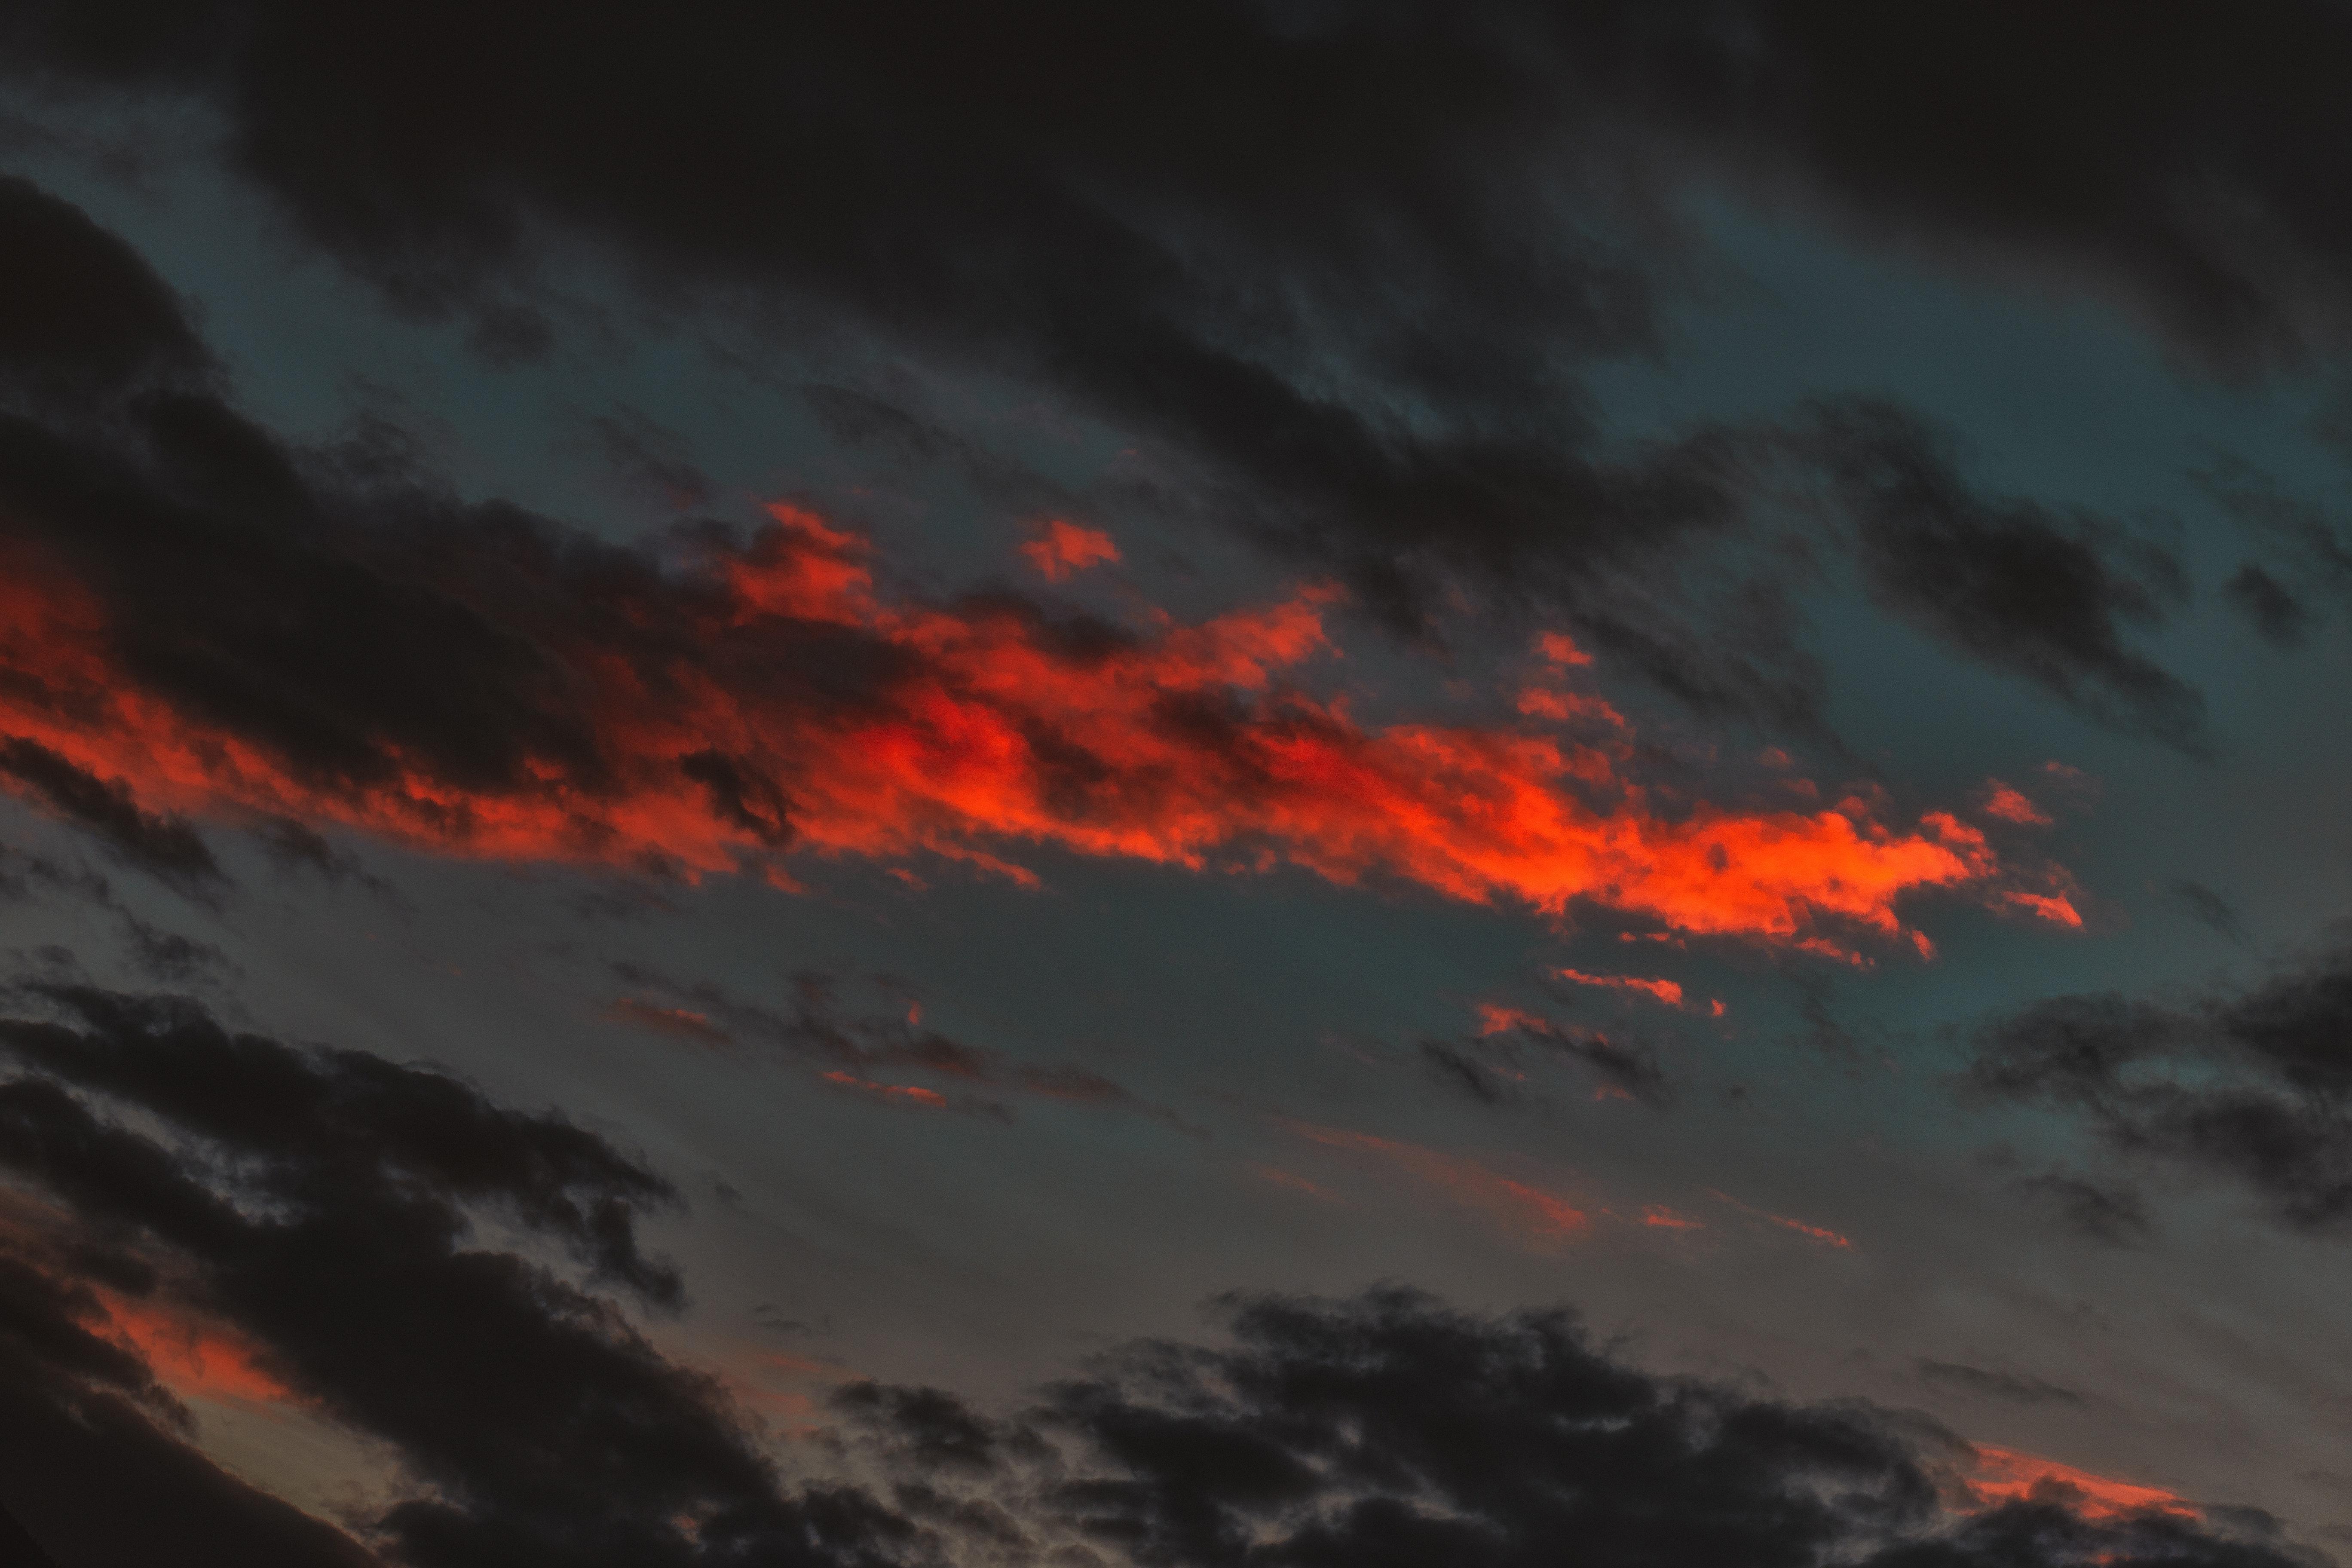 Free Images Android Wallpaper Calamity Clouds Dark Desktop